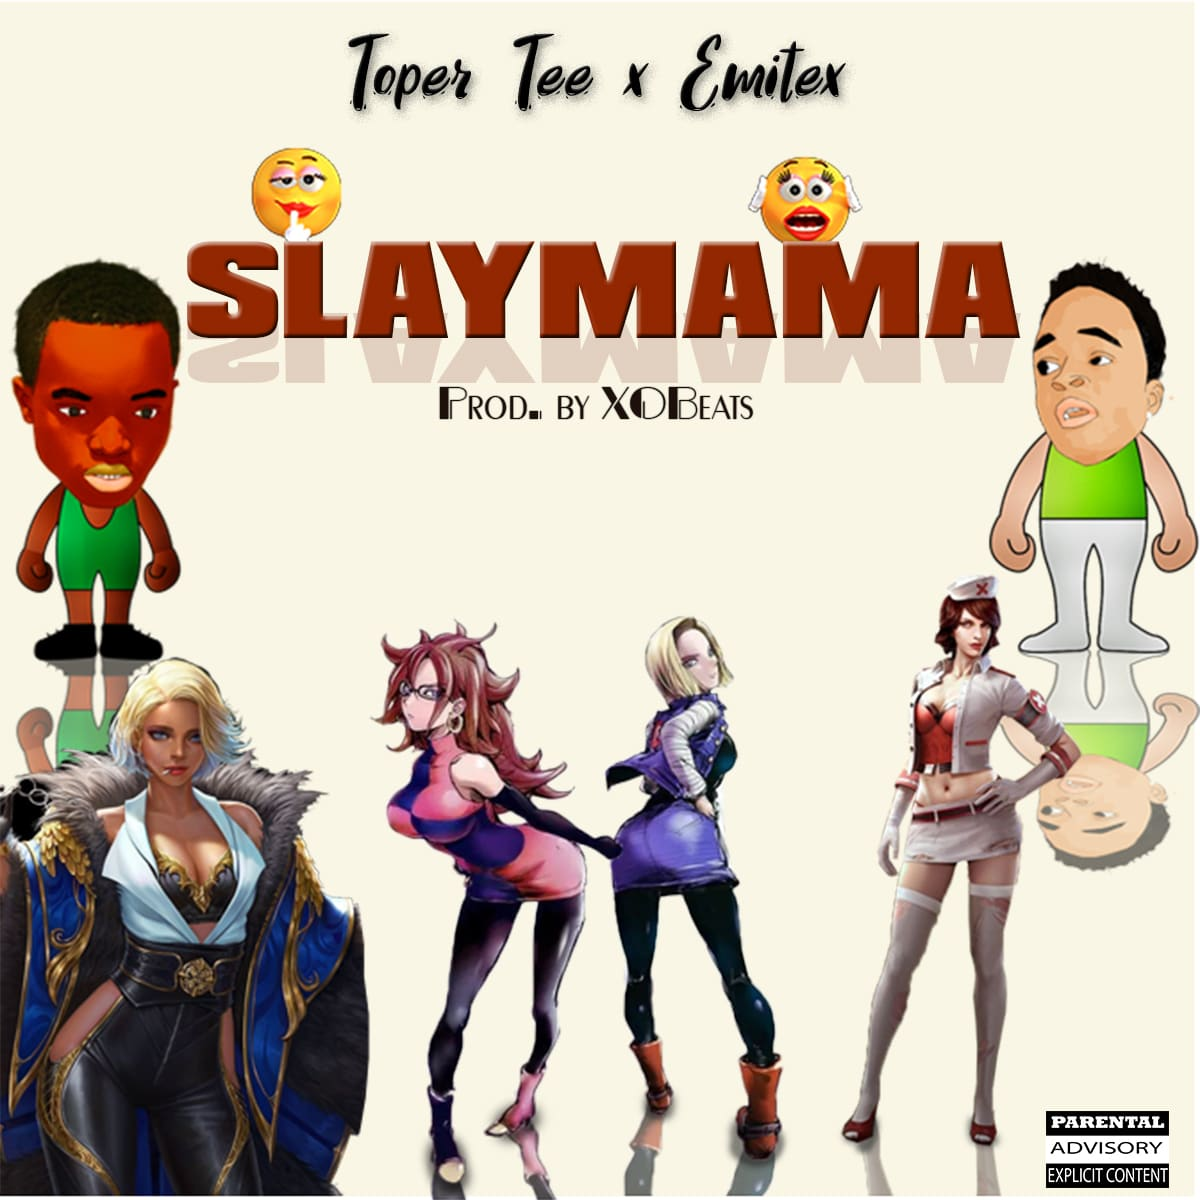 Toper tee slay mama